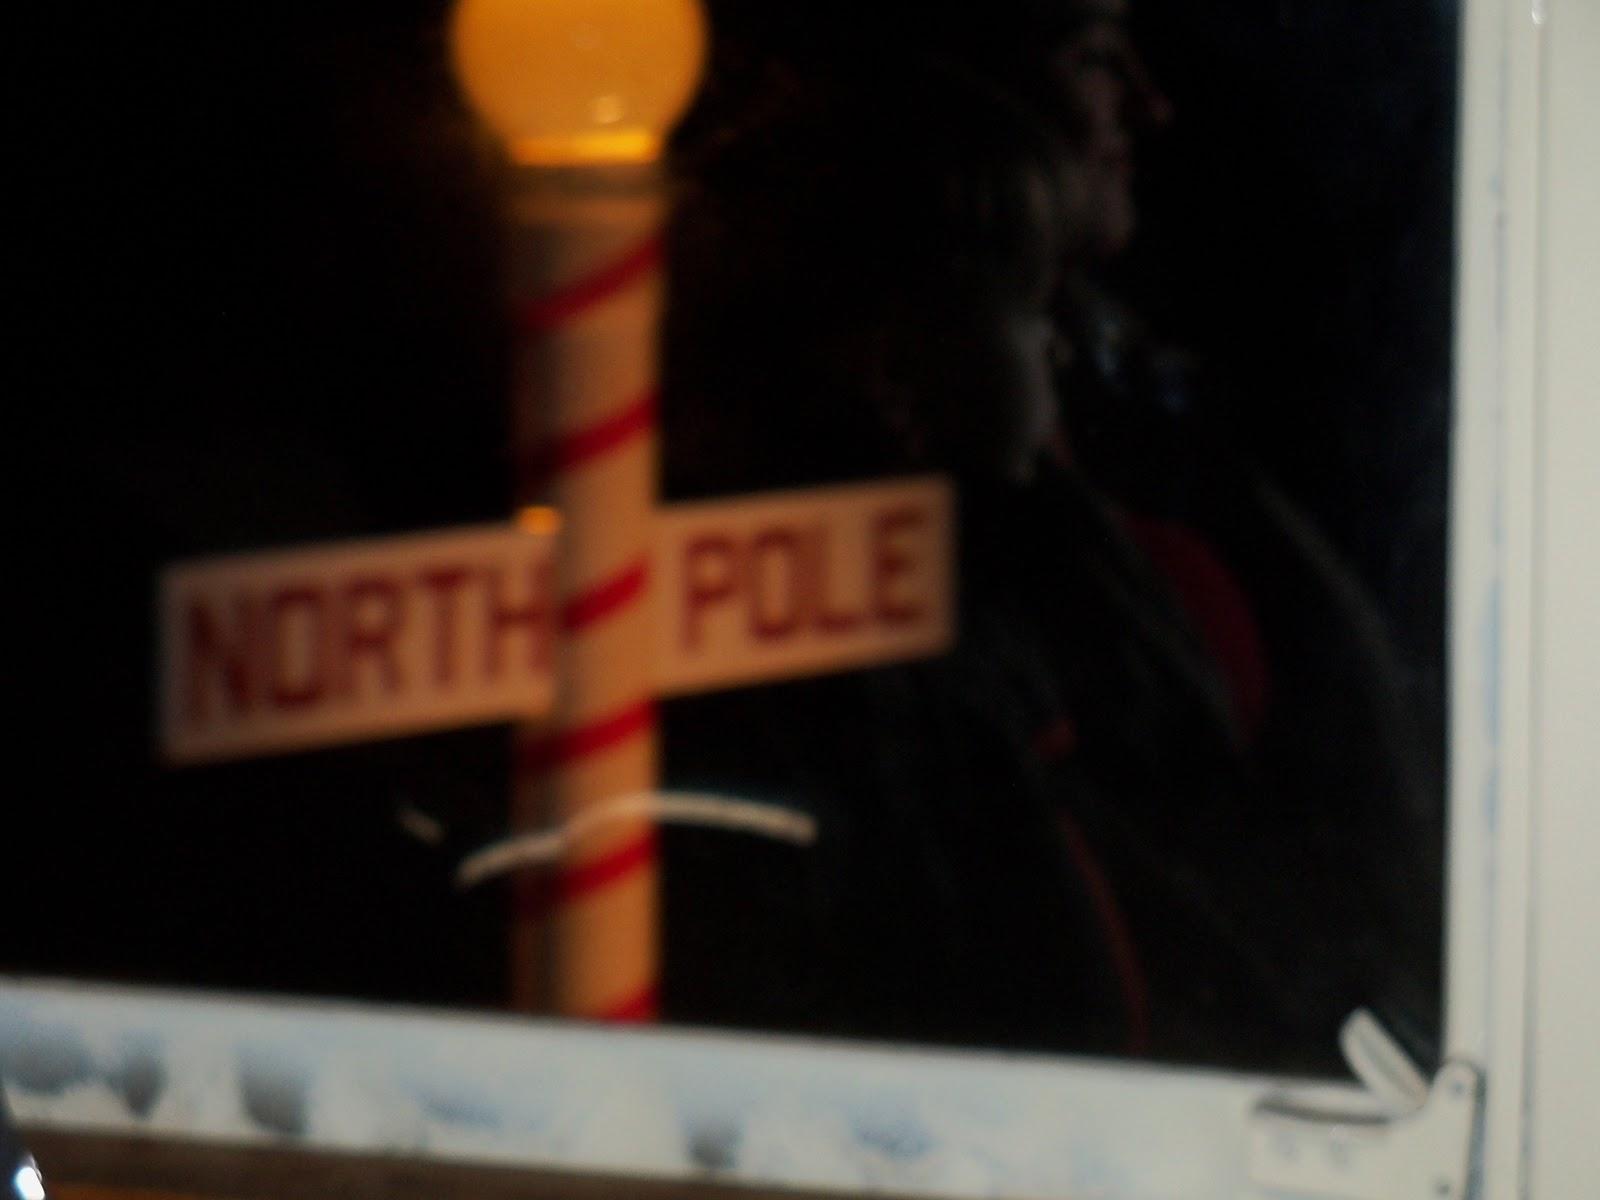 Polar Express Christmas Train 2010 - 100_6284.JPG